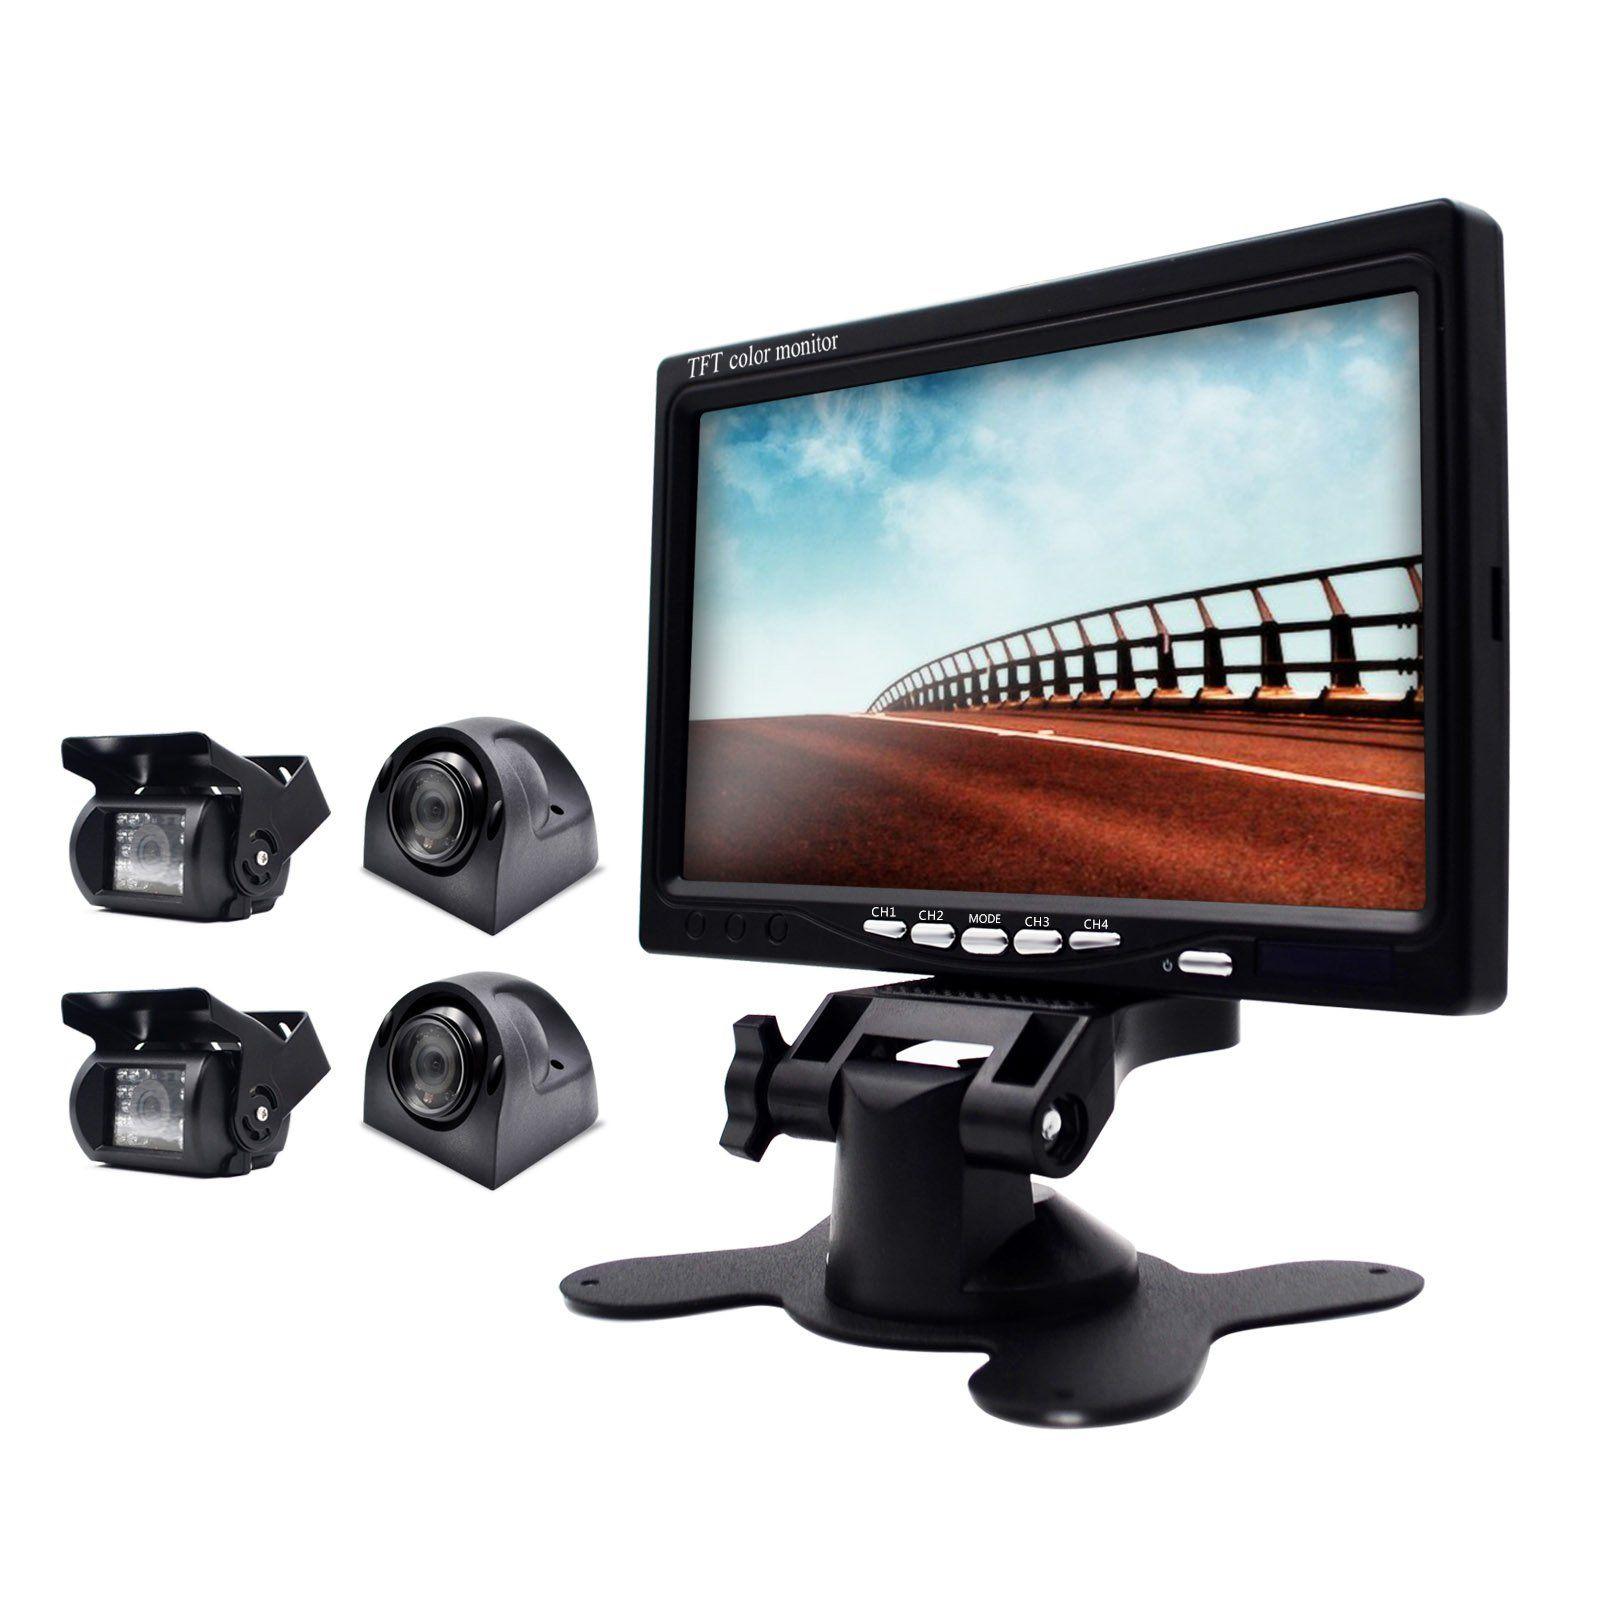 eRapta ER0202 Wired 7 Inch Split Quad Monitor and Waterproof ...